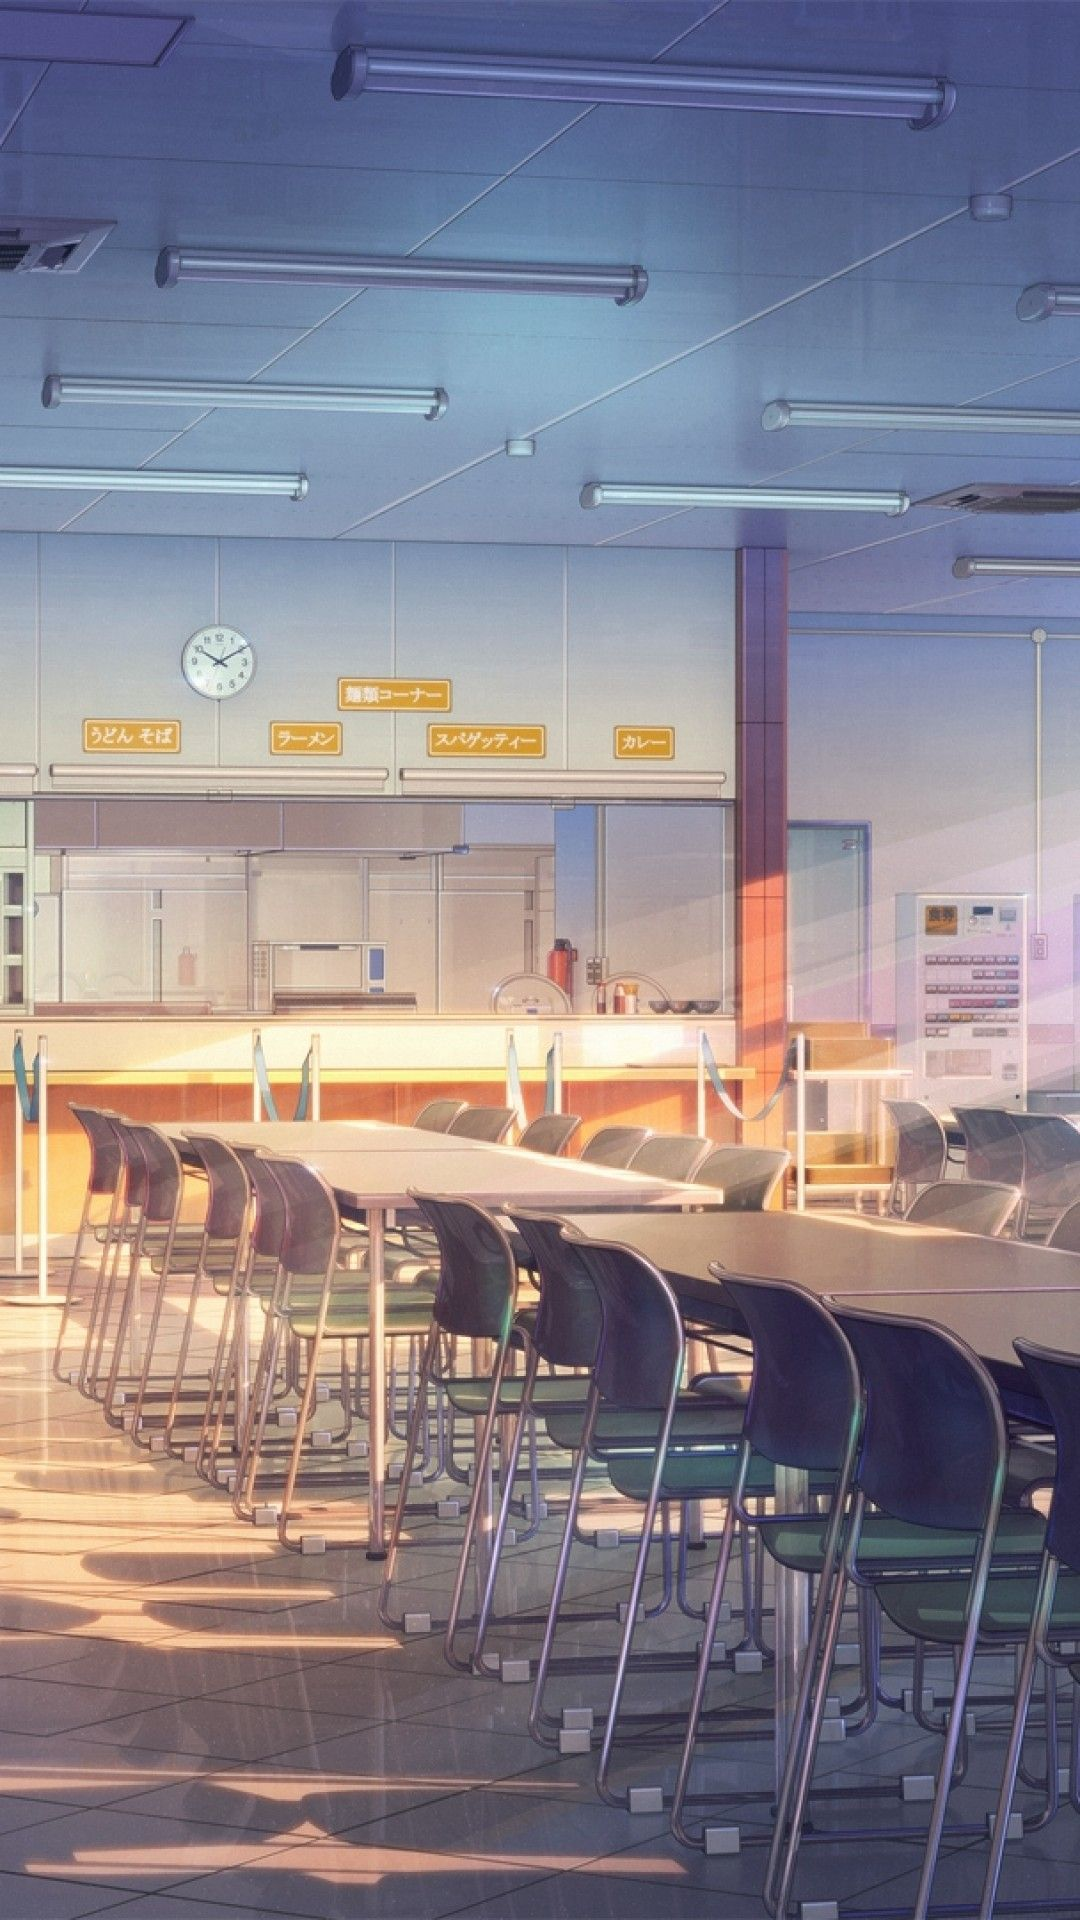 Aesthetic anime theme illustration of a boy and girl. Anime Building School Cafeteria Sunshine Windows Artwork ...